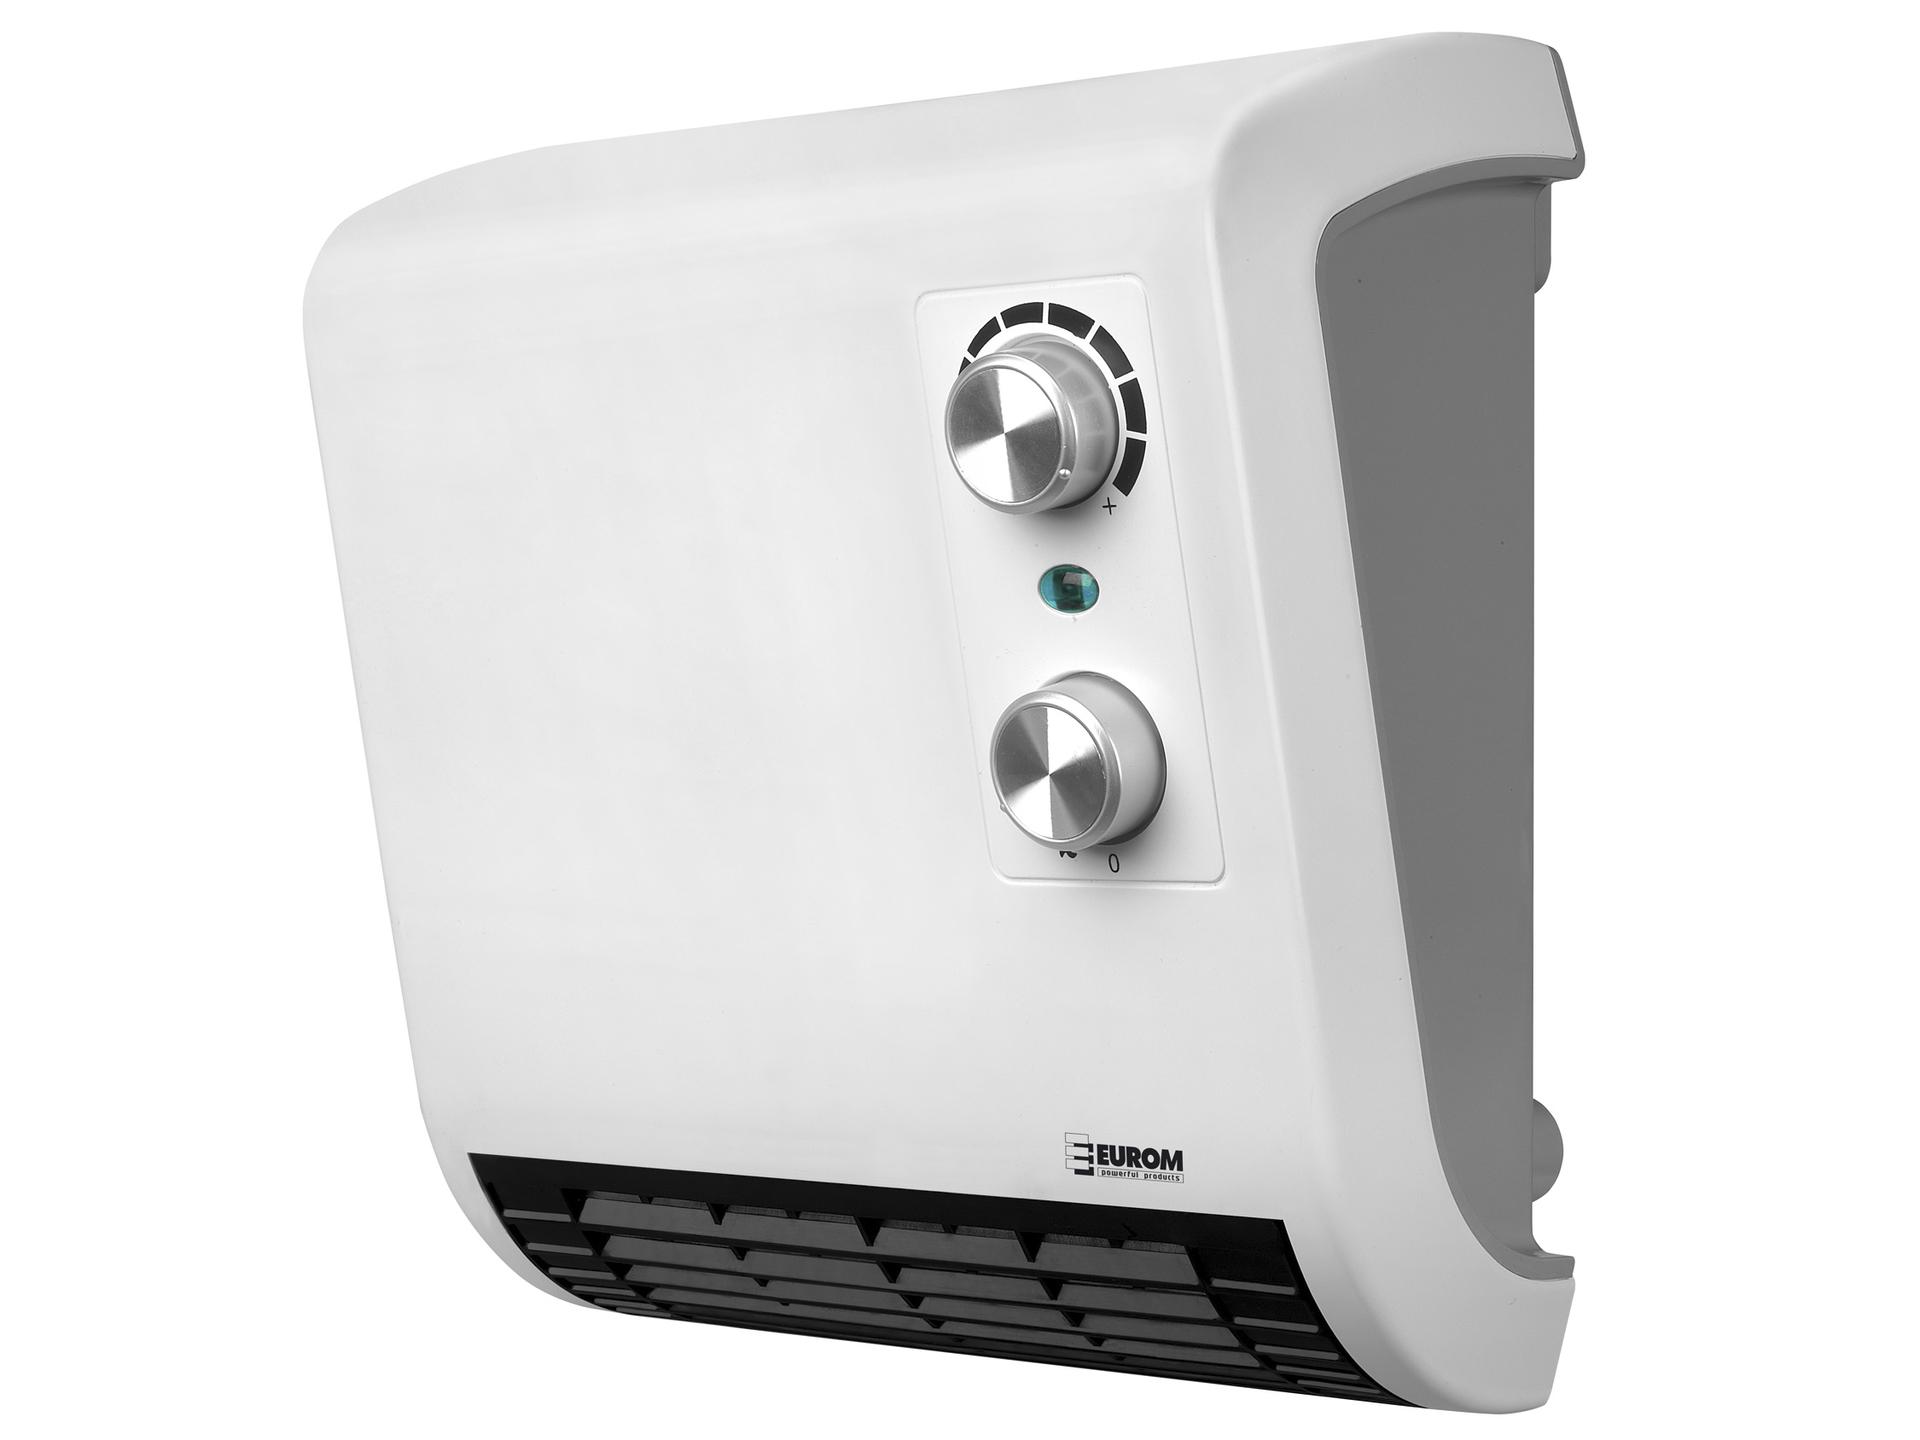 Badkamer Verwarming Hubo : Eurom warmeluchtblazer sani fanheat 2000w hubo